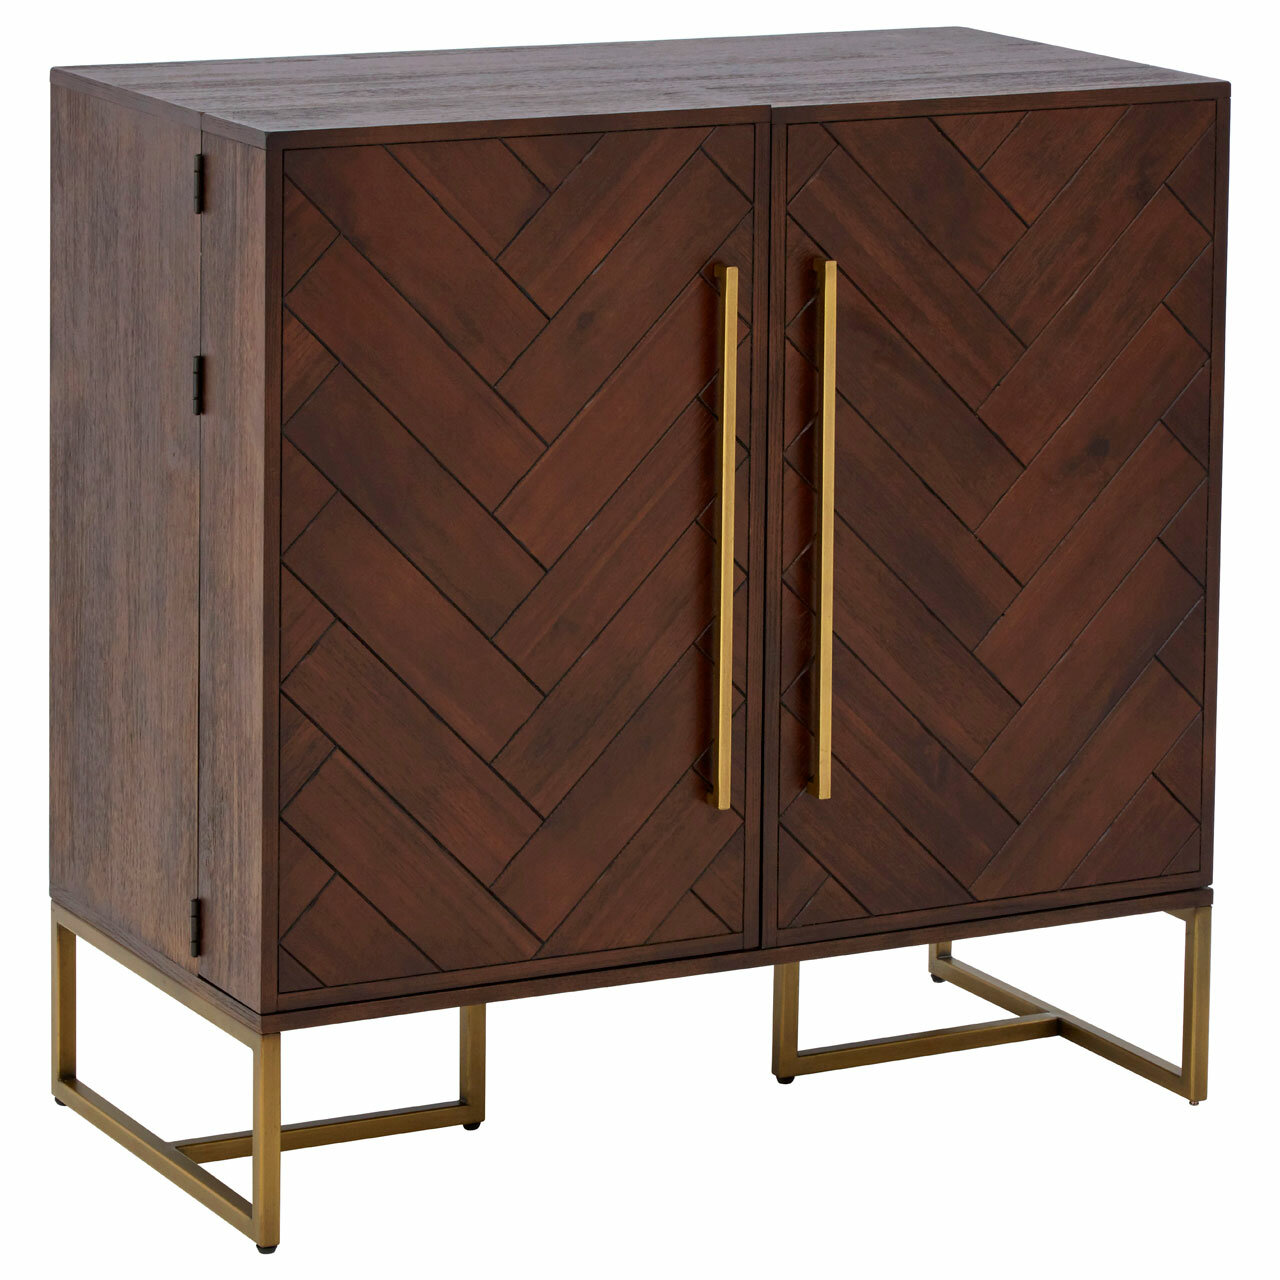 pdx cabinet willa interiors furniture arlo door reviews wayfair roush